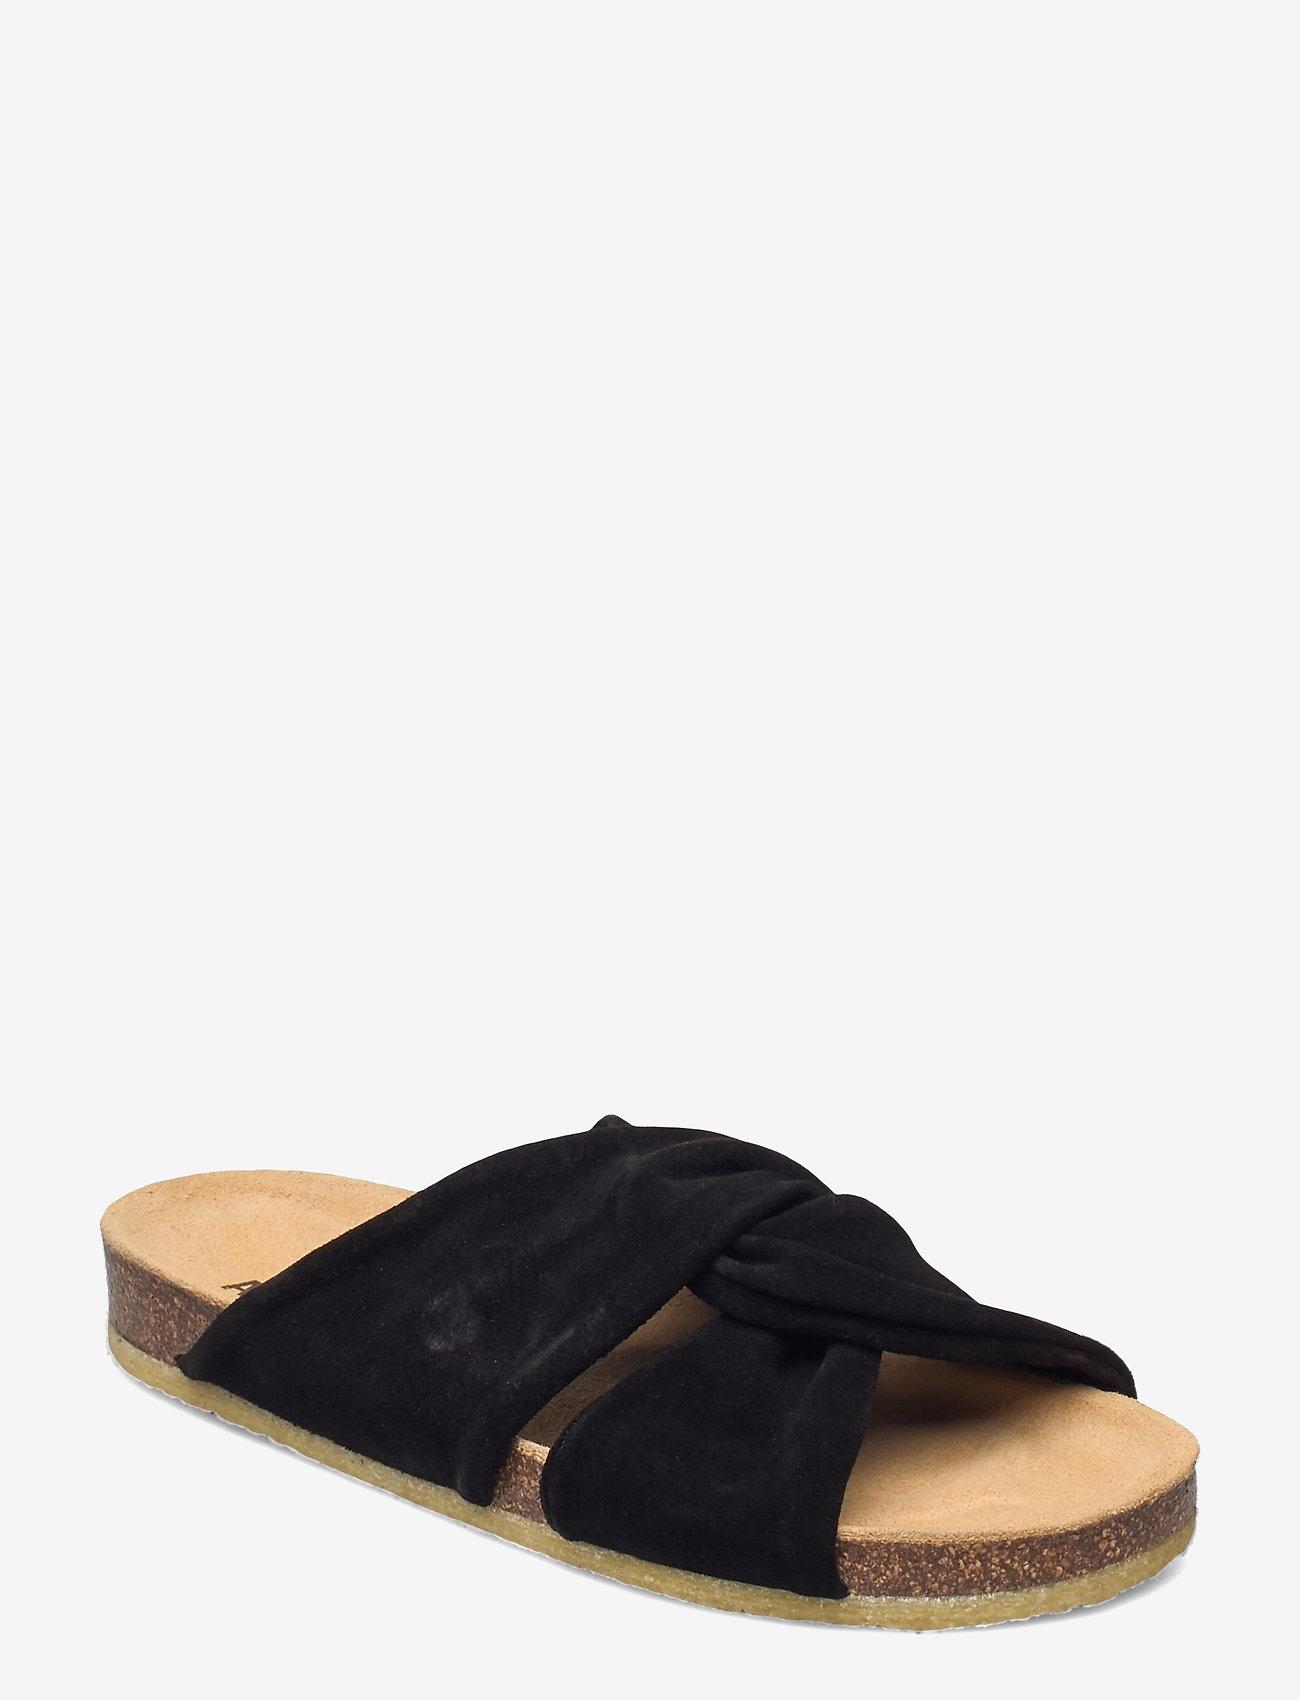 ANGULUS - Sandals - flat - open toe - op - flache sandalen - 1163 black - 0